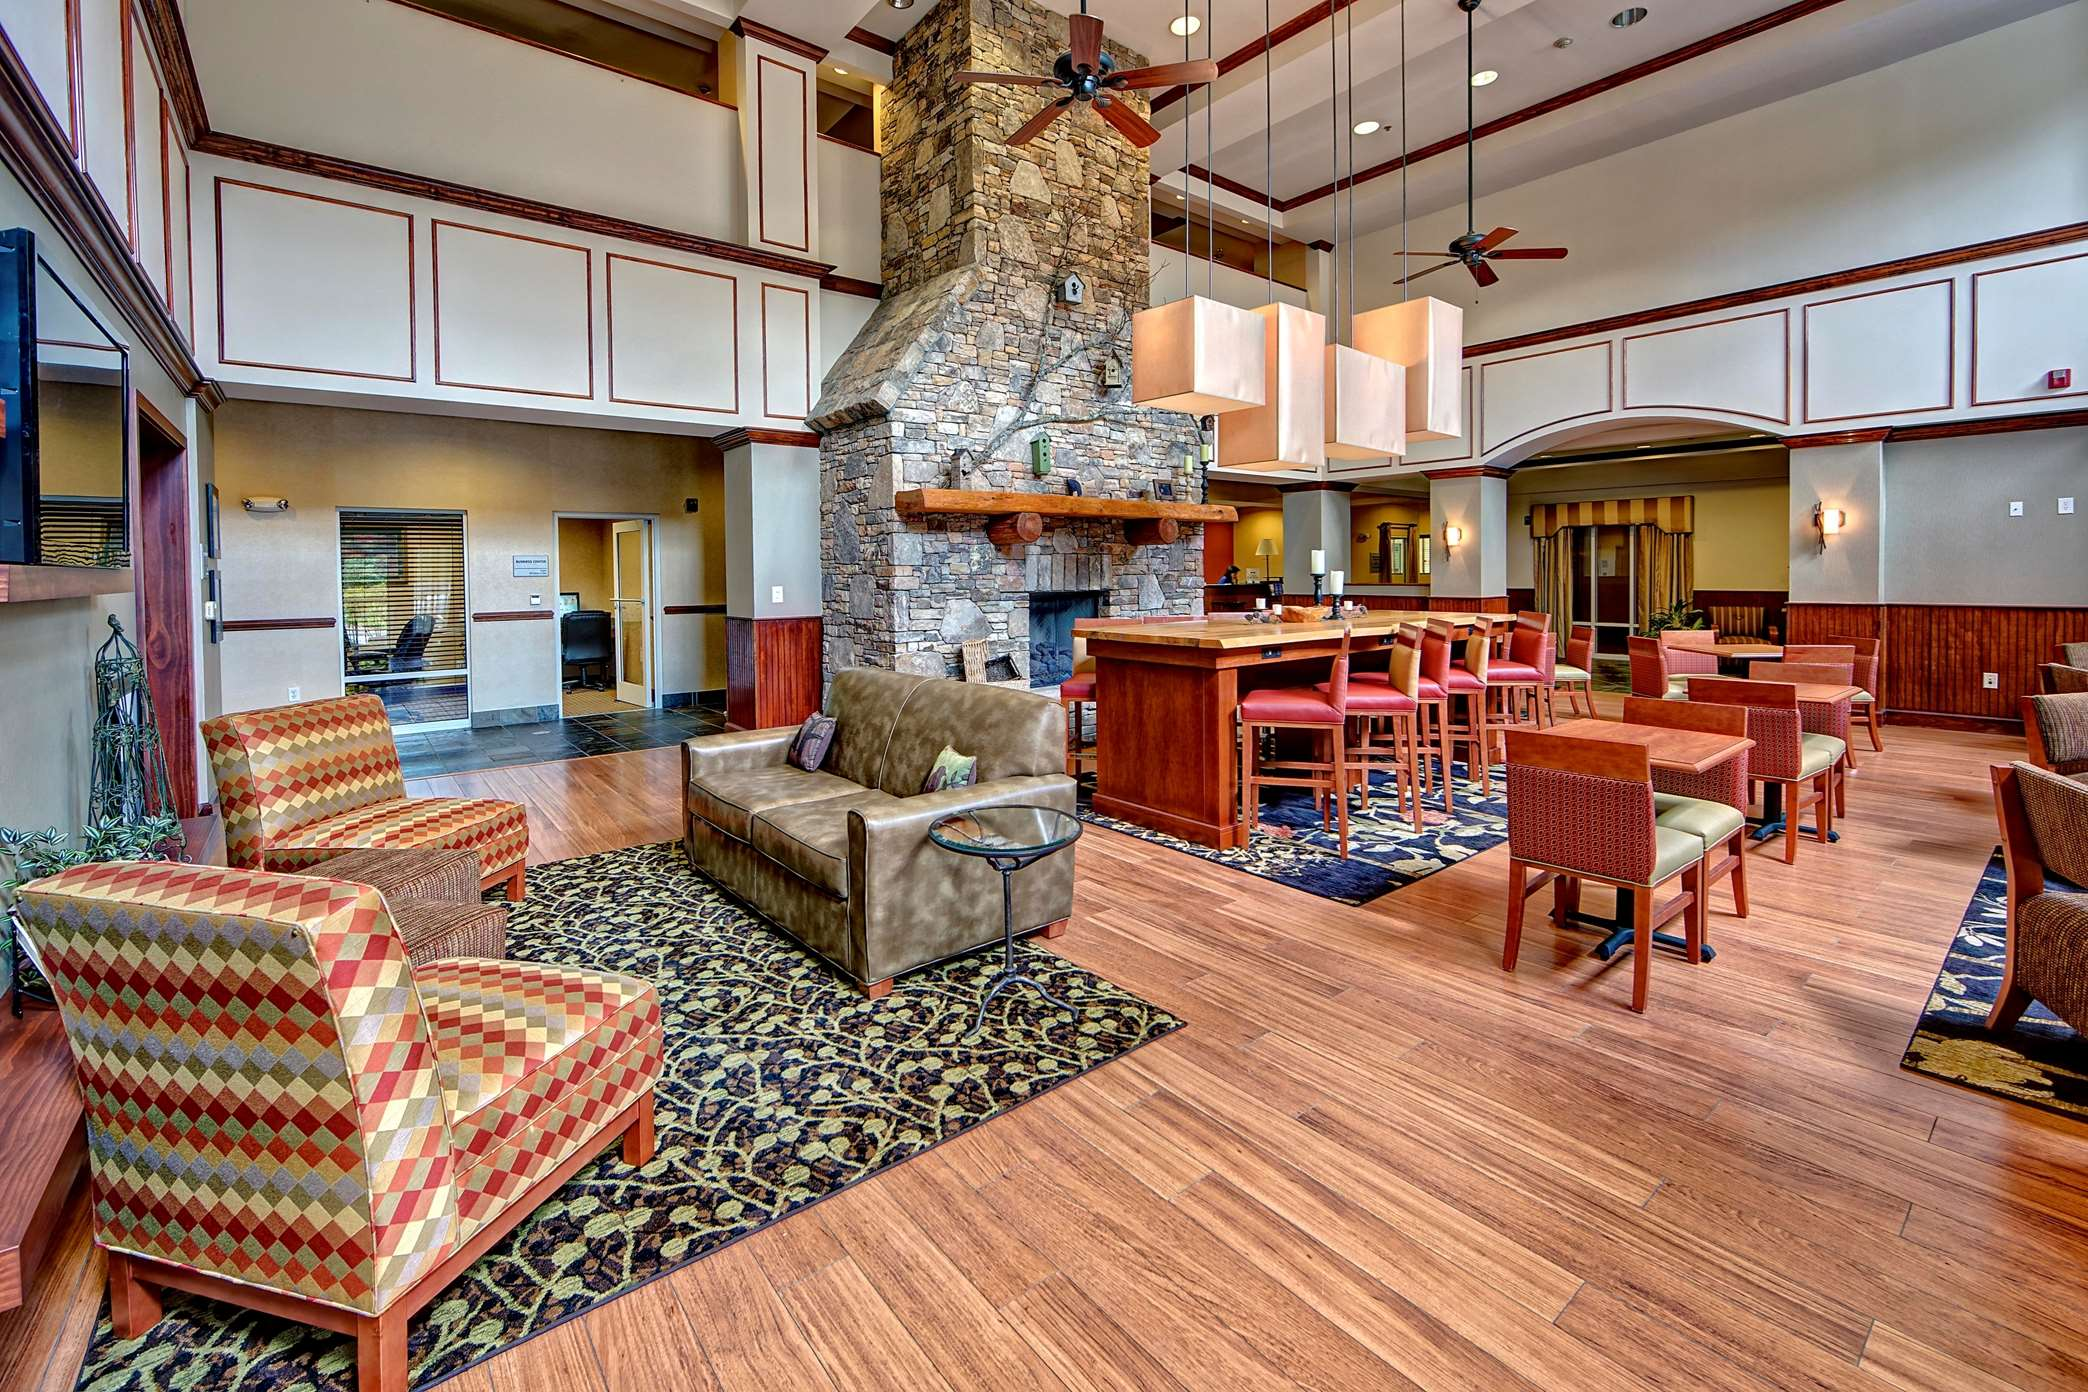 Hampton Inn & Suites Cashiers-Sapphire Valley image 17